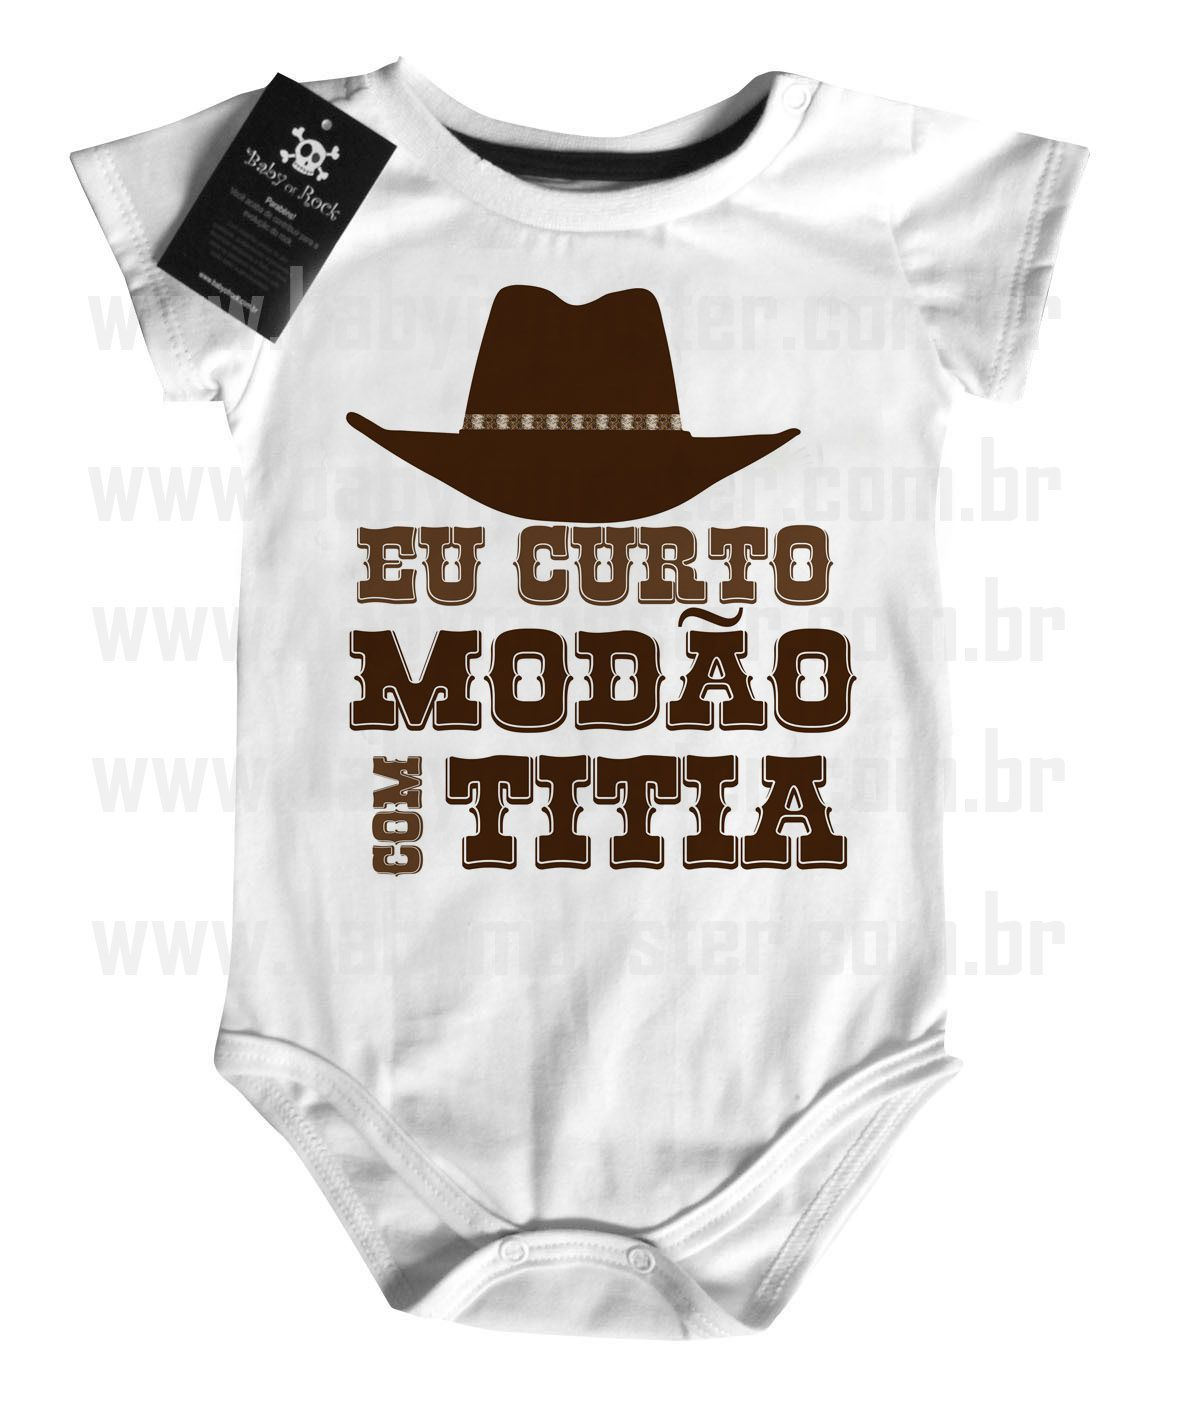 Body  Sertanejo Curto Modão com a Titia - White  - Baby Monster S/A